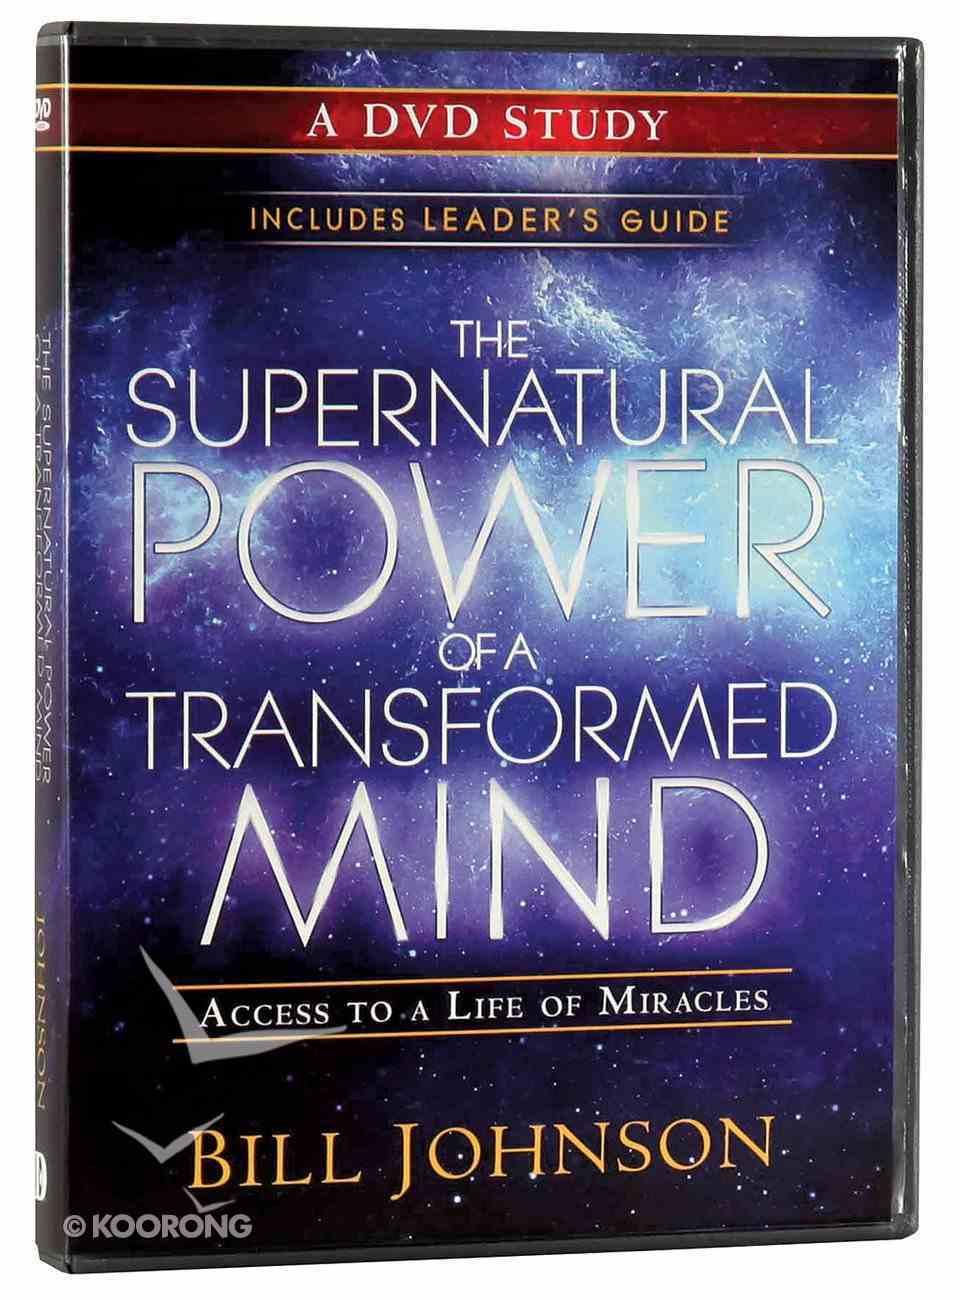 The Supernatural Power of a Transformed Mind (A Dvd Study) DVD